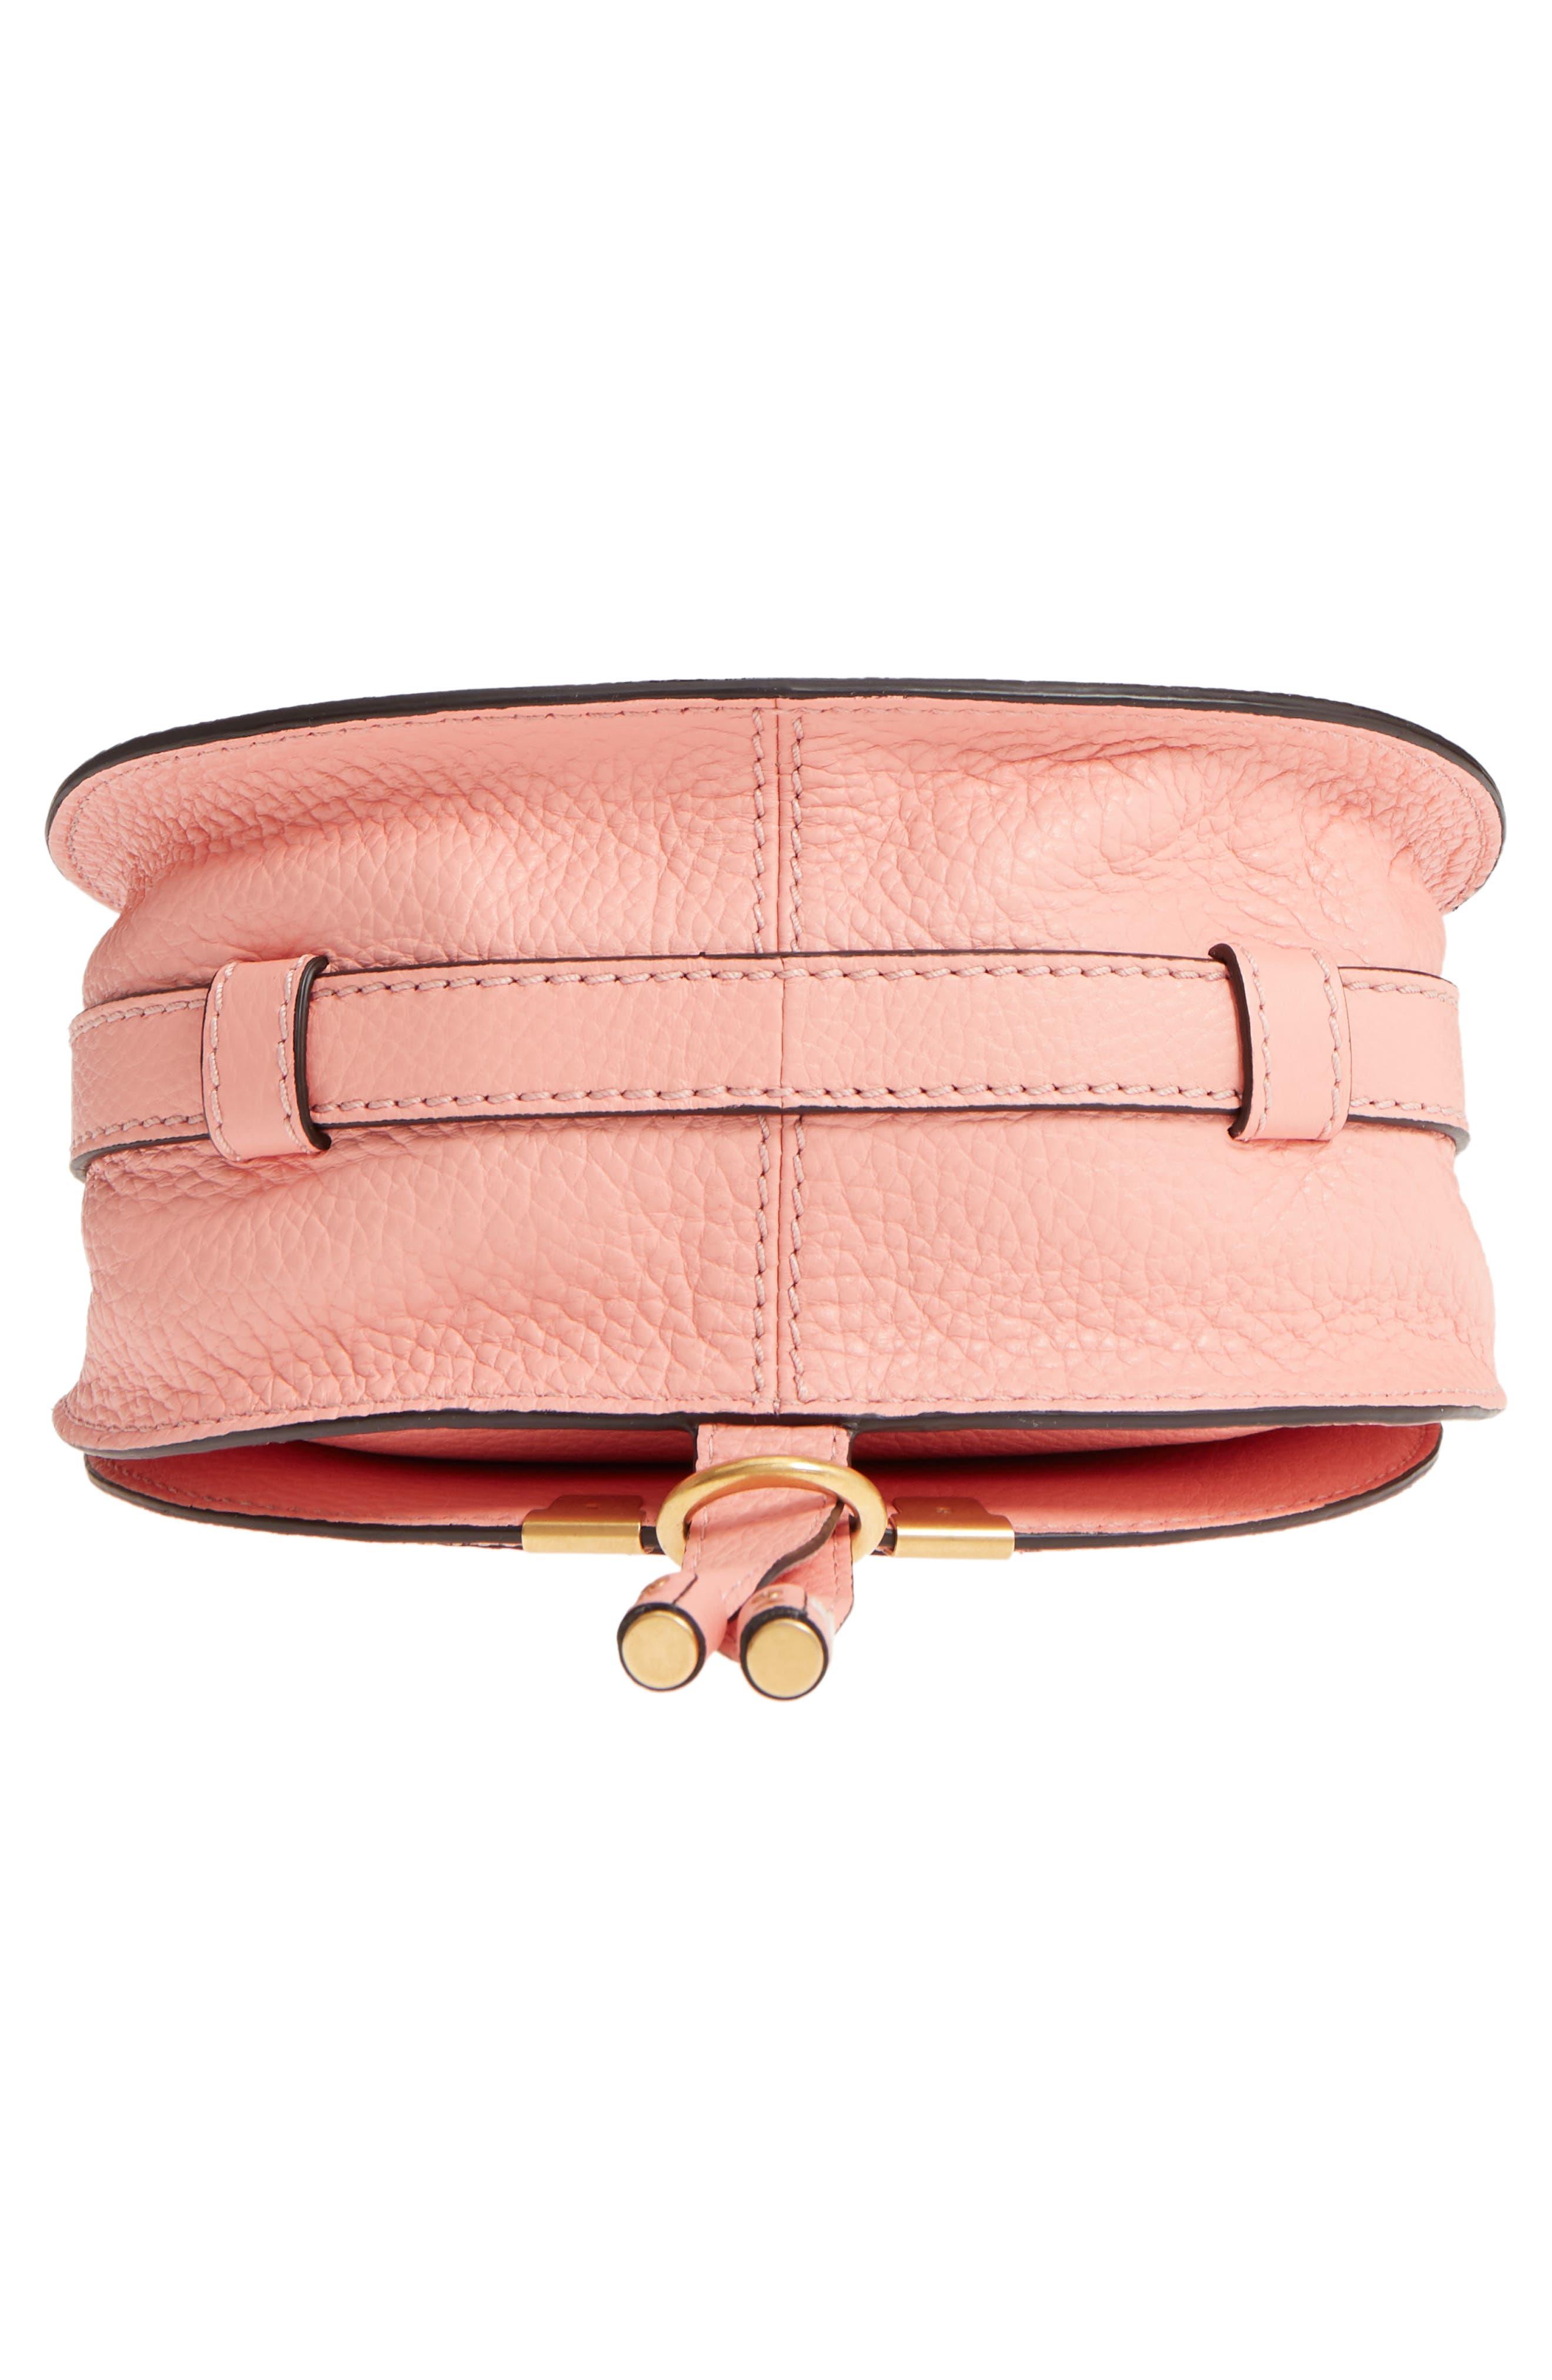 'Mini Marcie' Leather Crossbody Bag,                             Alternate thumbnail 6, color,                             Ideal Blush